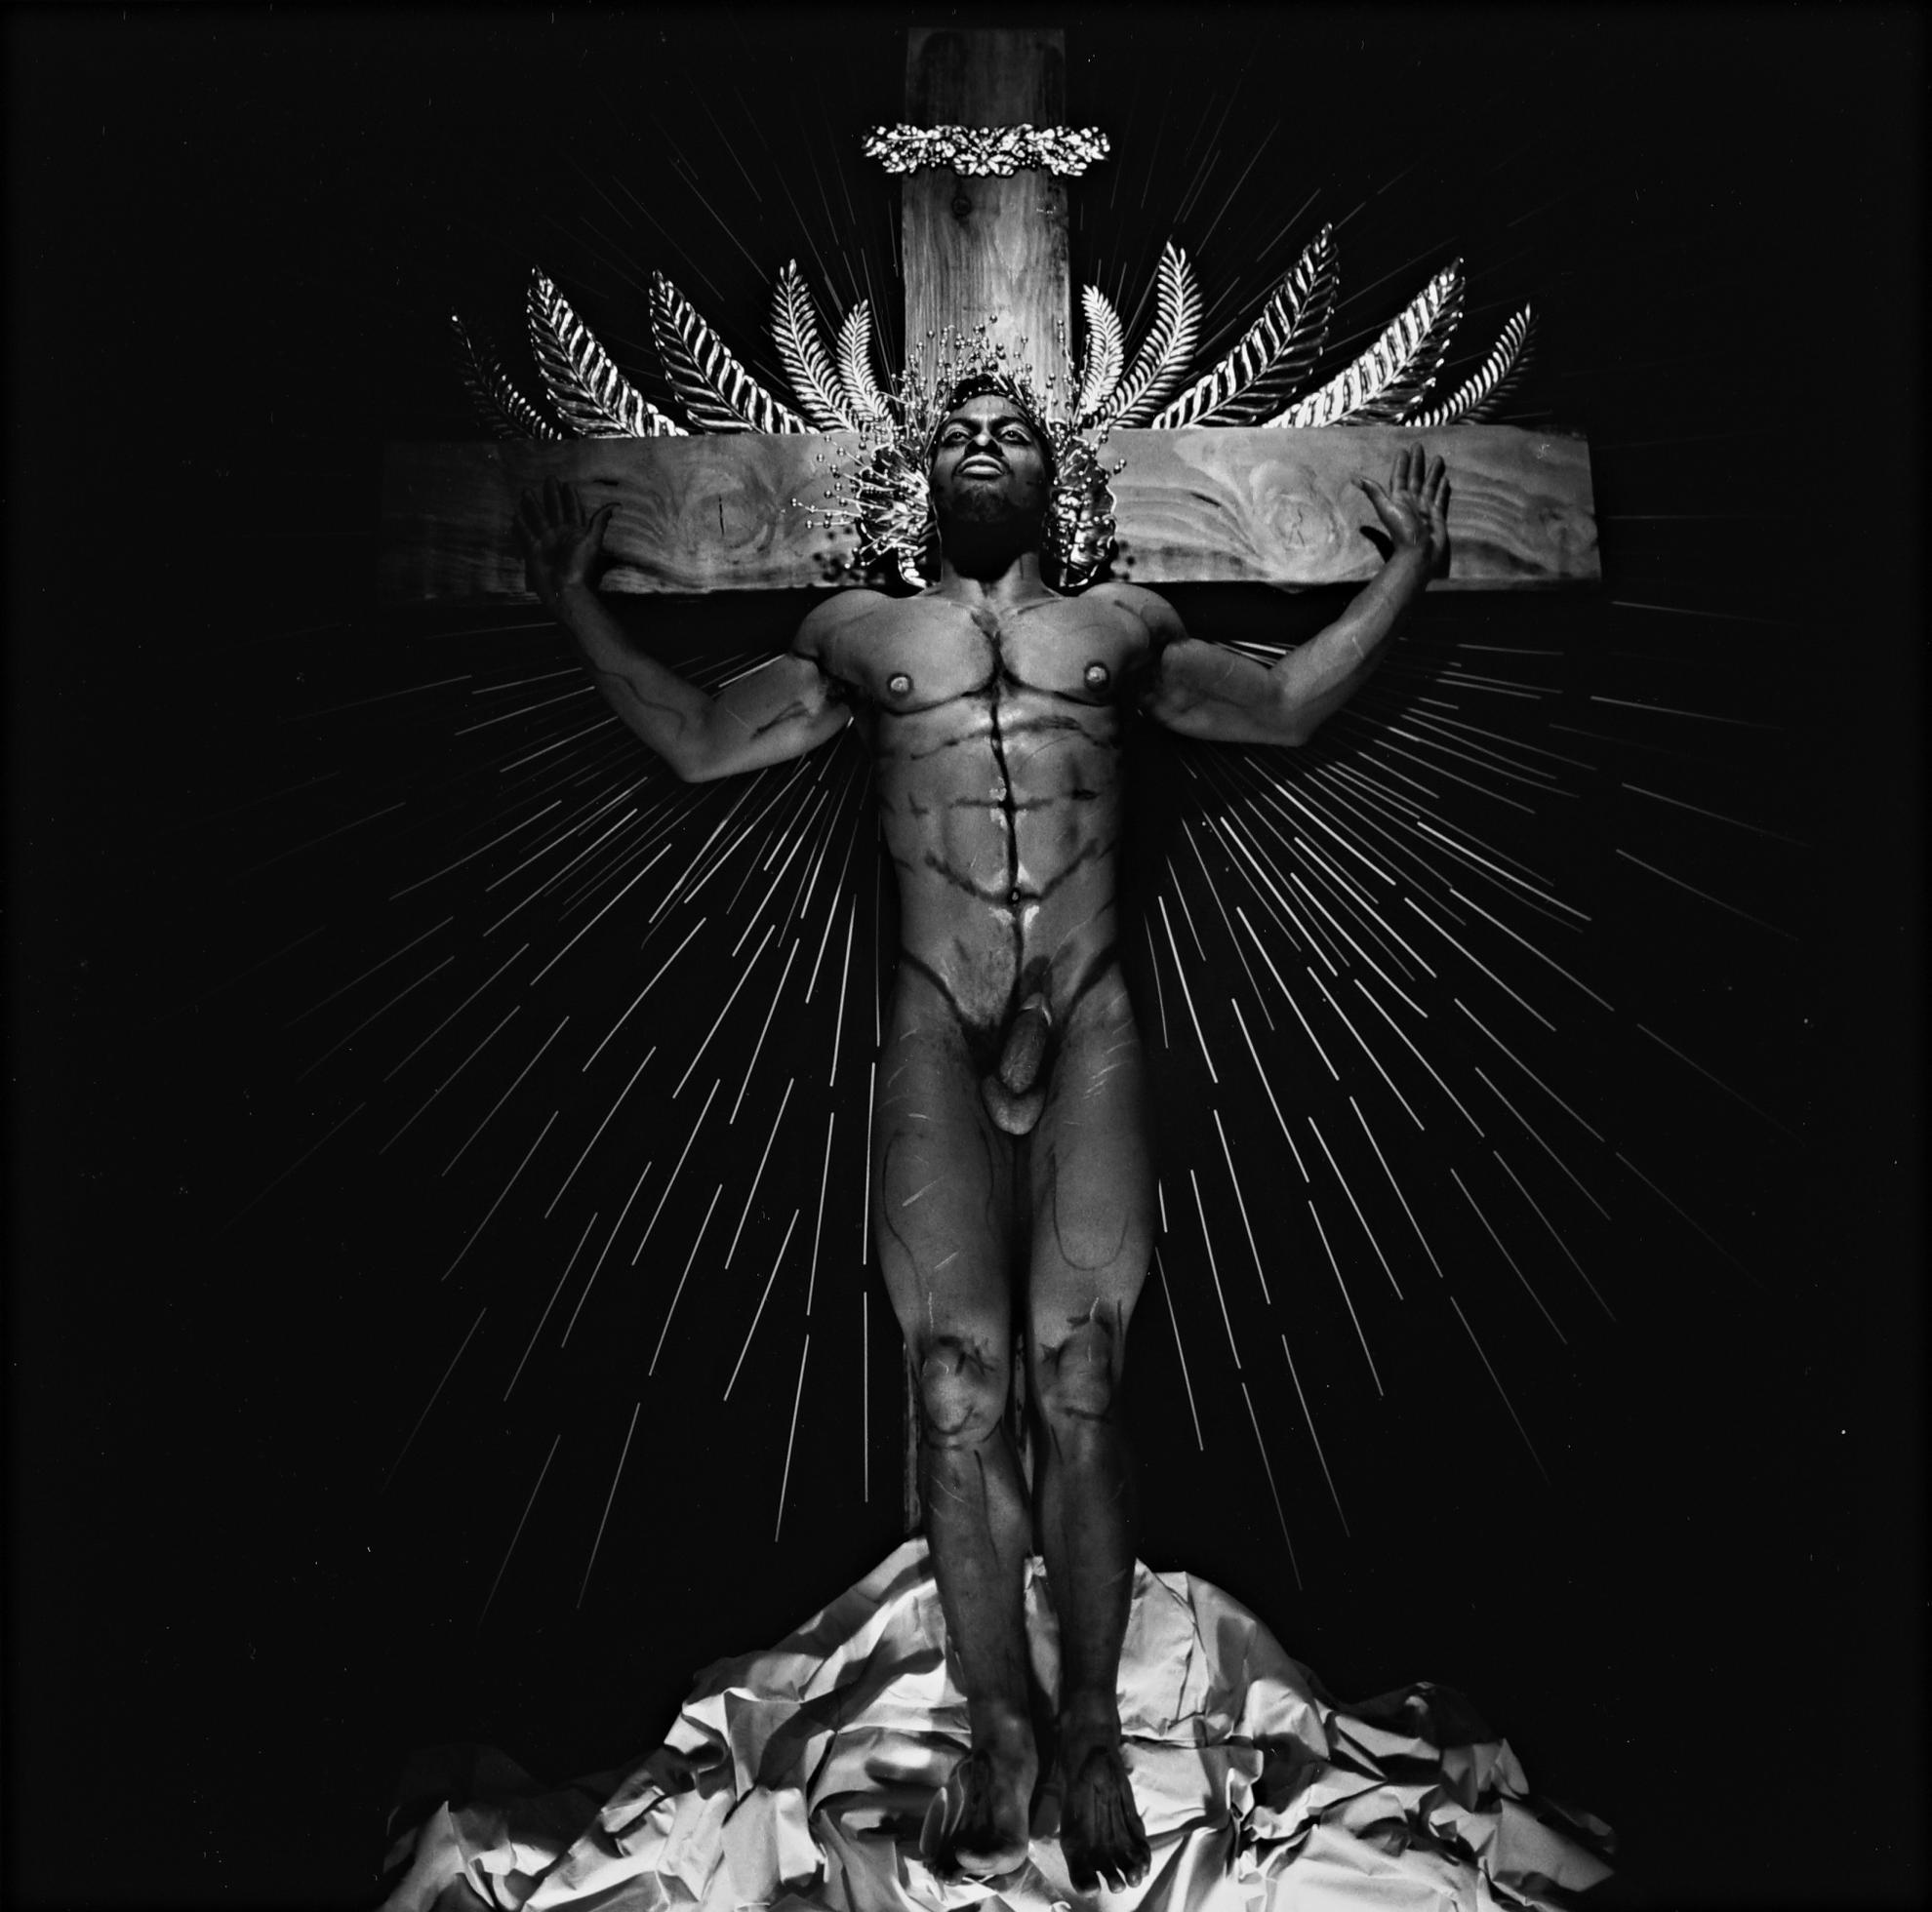 Steven Arnold - Black Jesus-1988